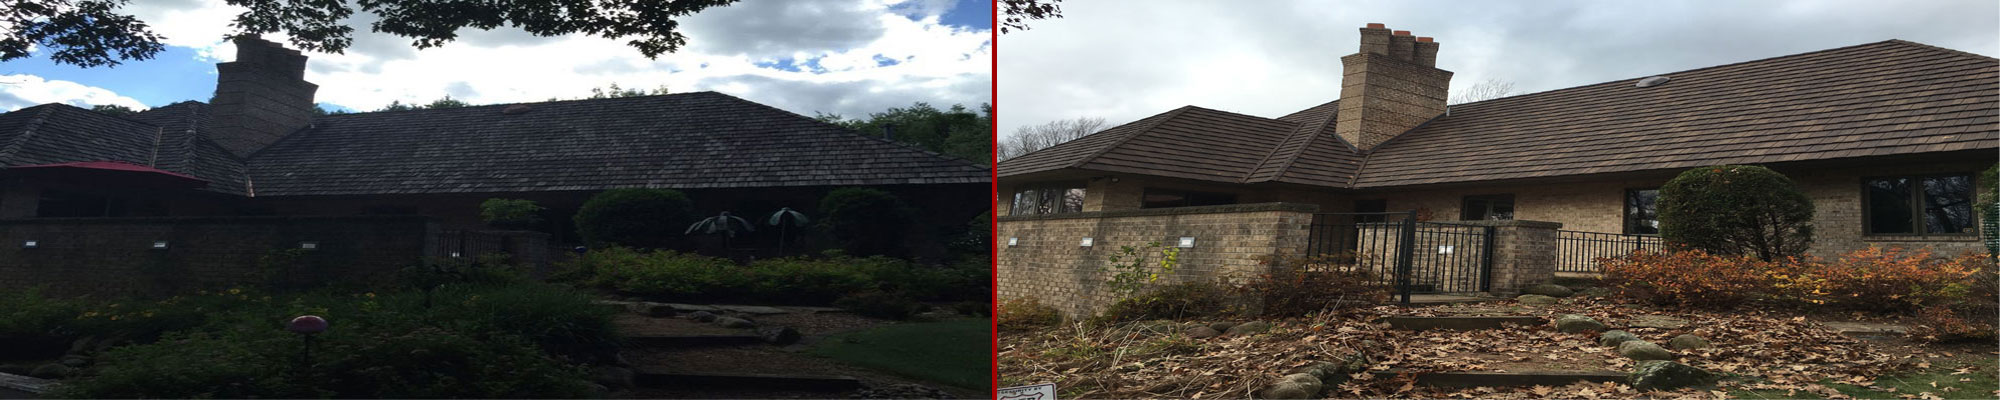 Stone Coated Steel Roofing Shingles Decra Metal Roofing